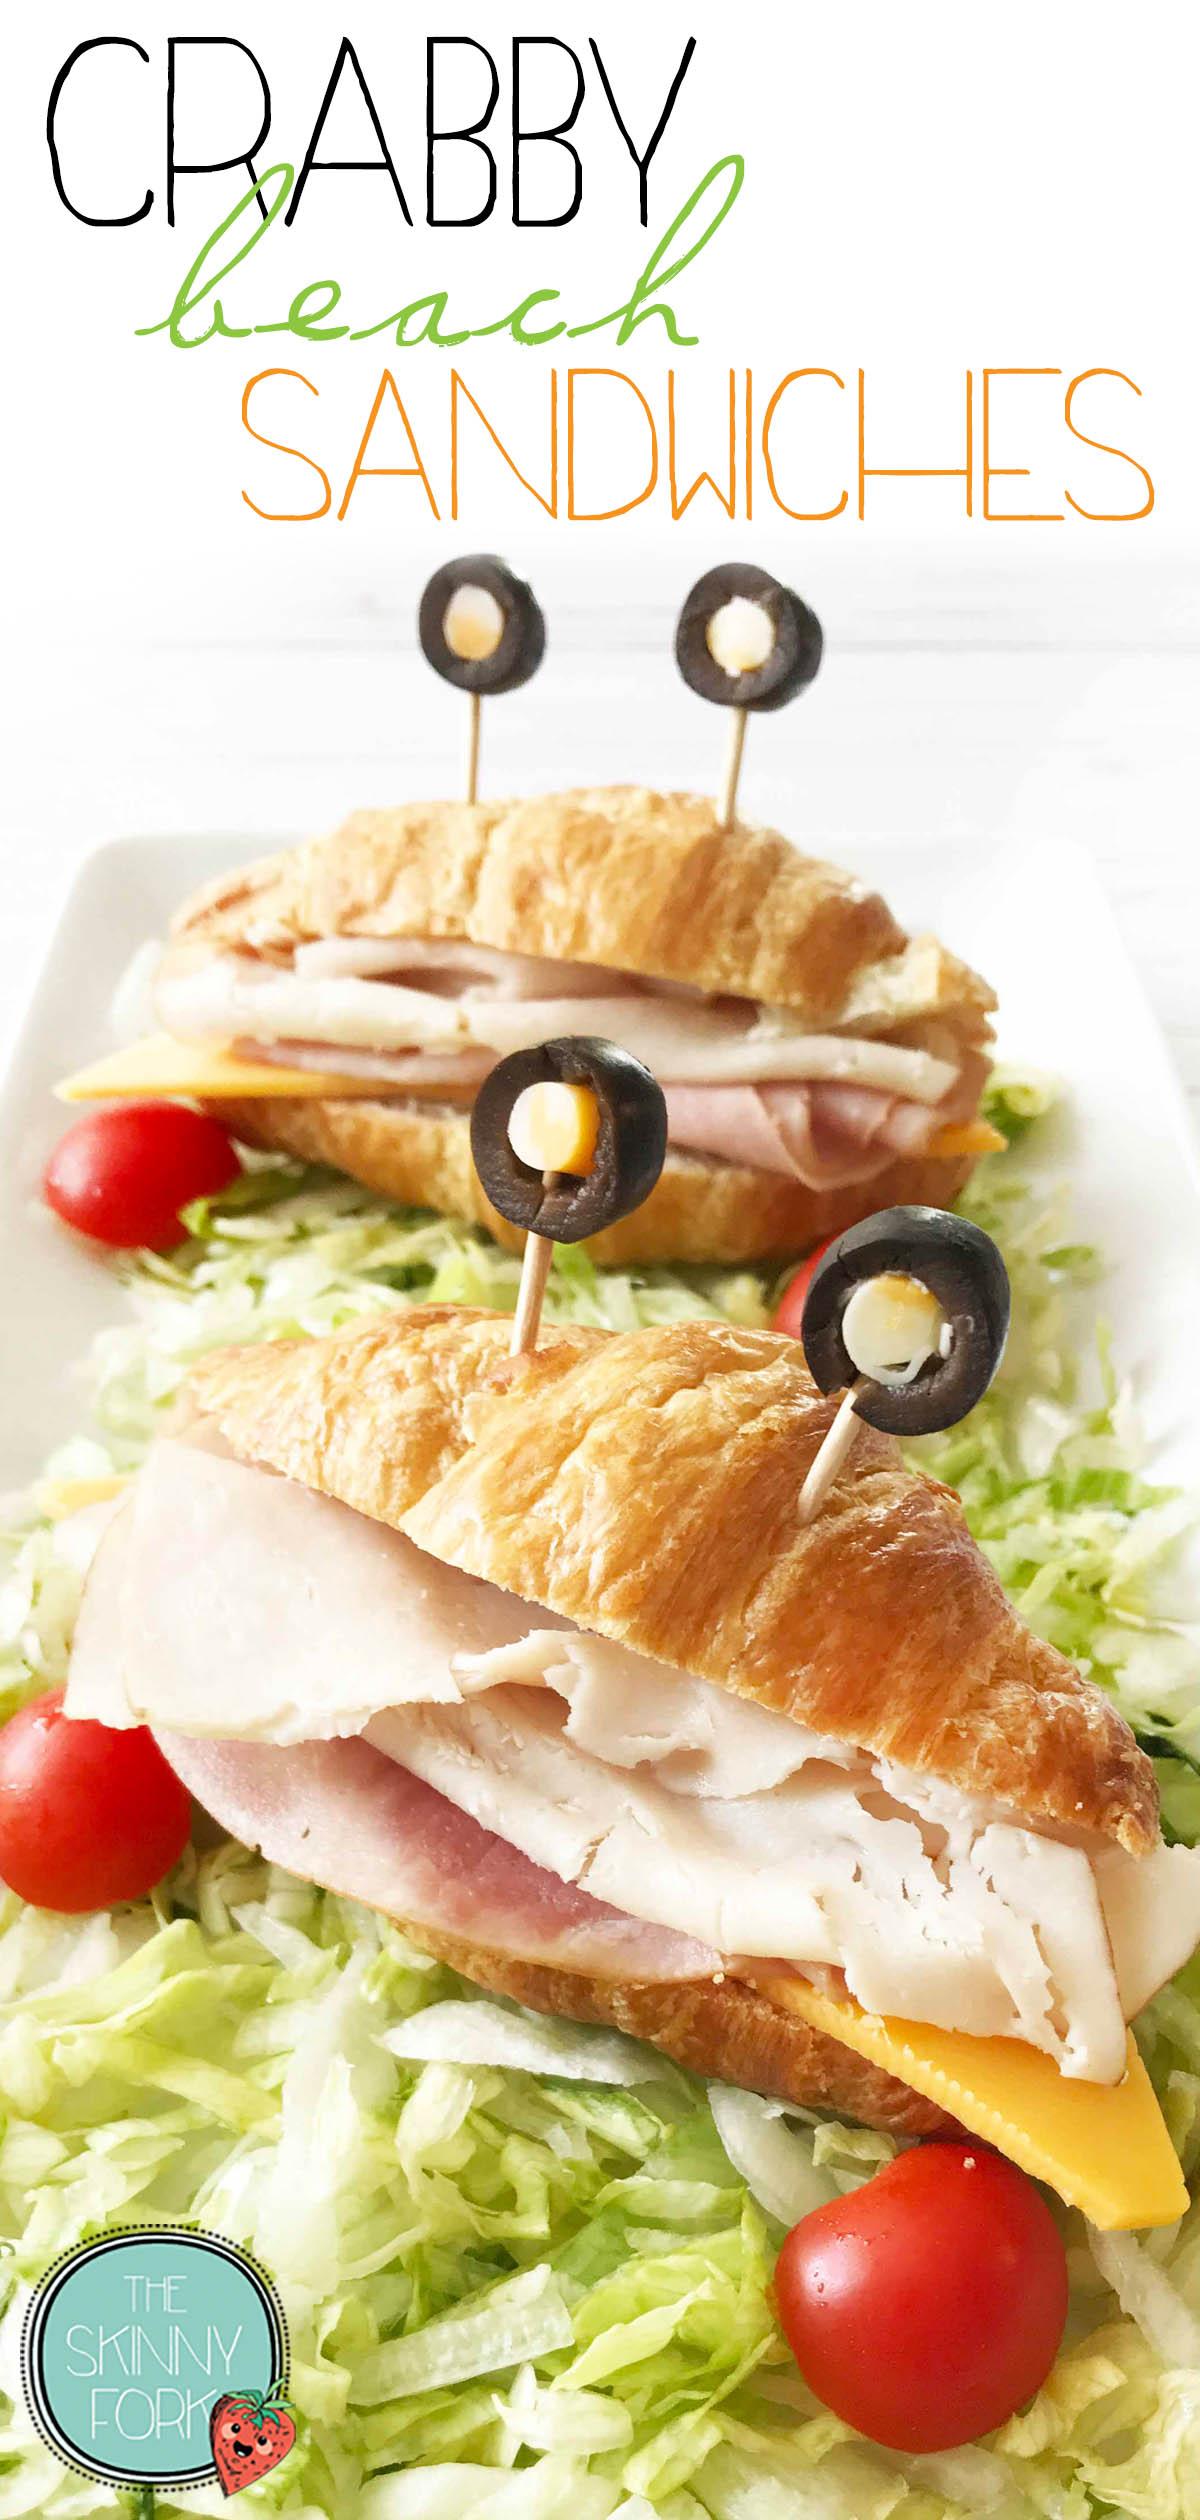 Crabby Beach Sandwich